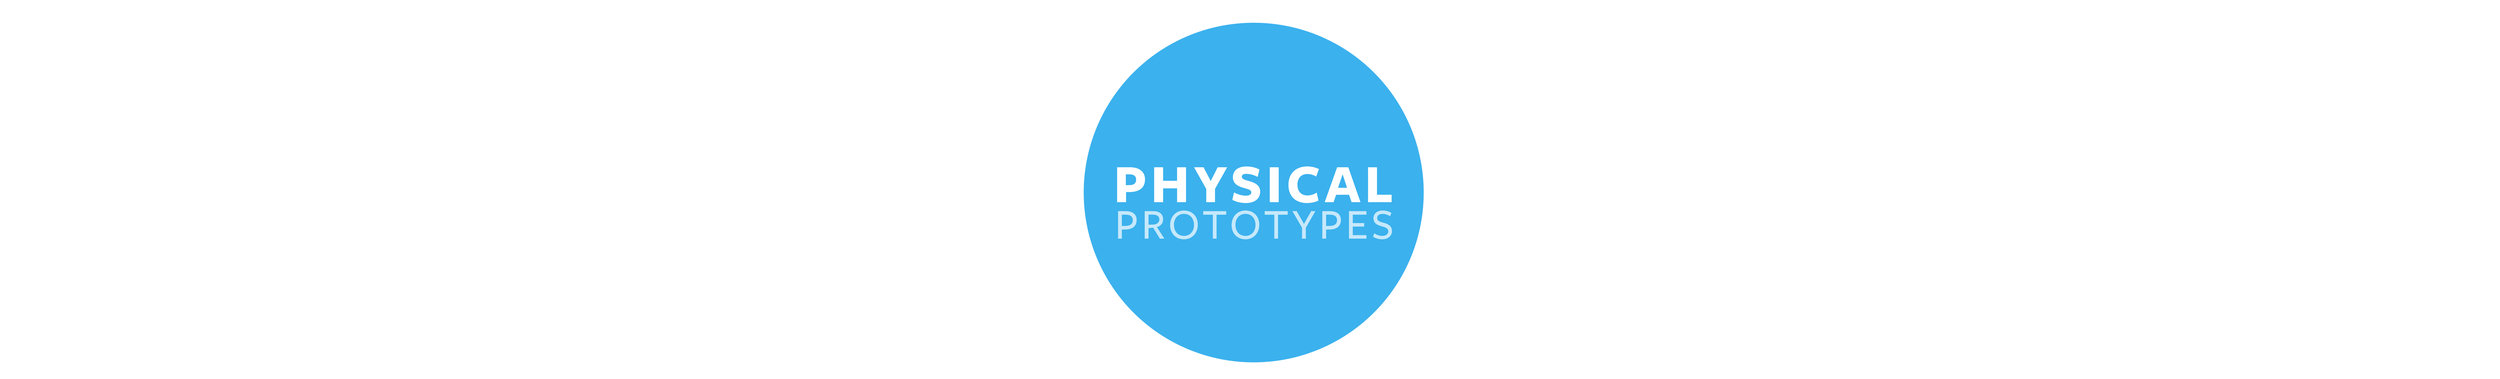 PHYSICAL PROTOTYPES.jpg